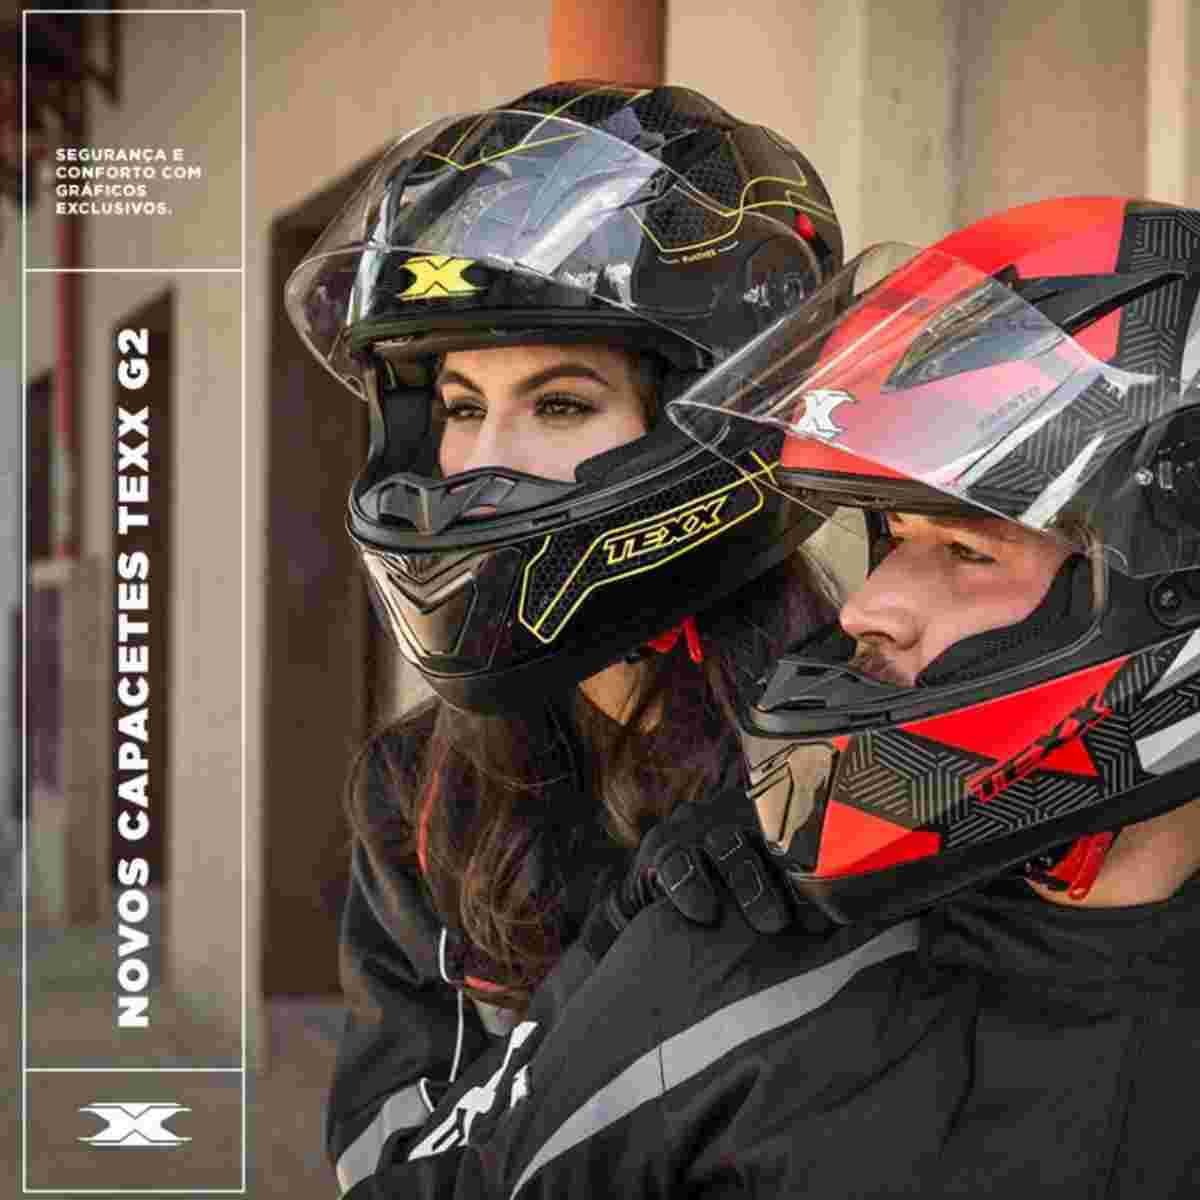 CAPACETE DE MOTO TEXX G2 TRENTO DESIGN ITALIANO COM SUN VISOR